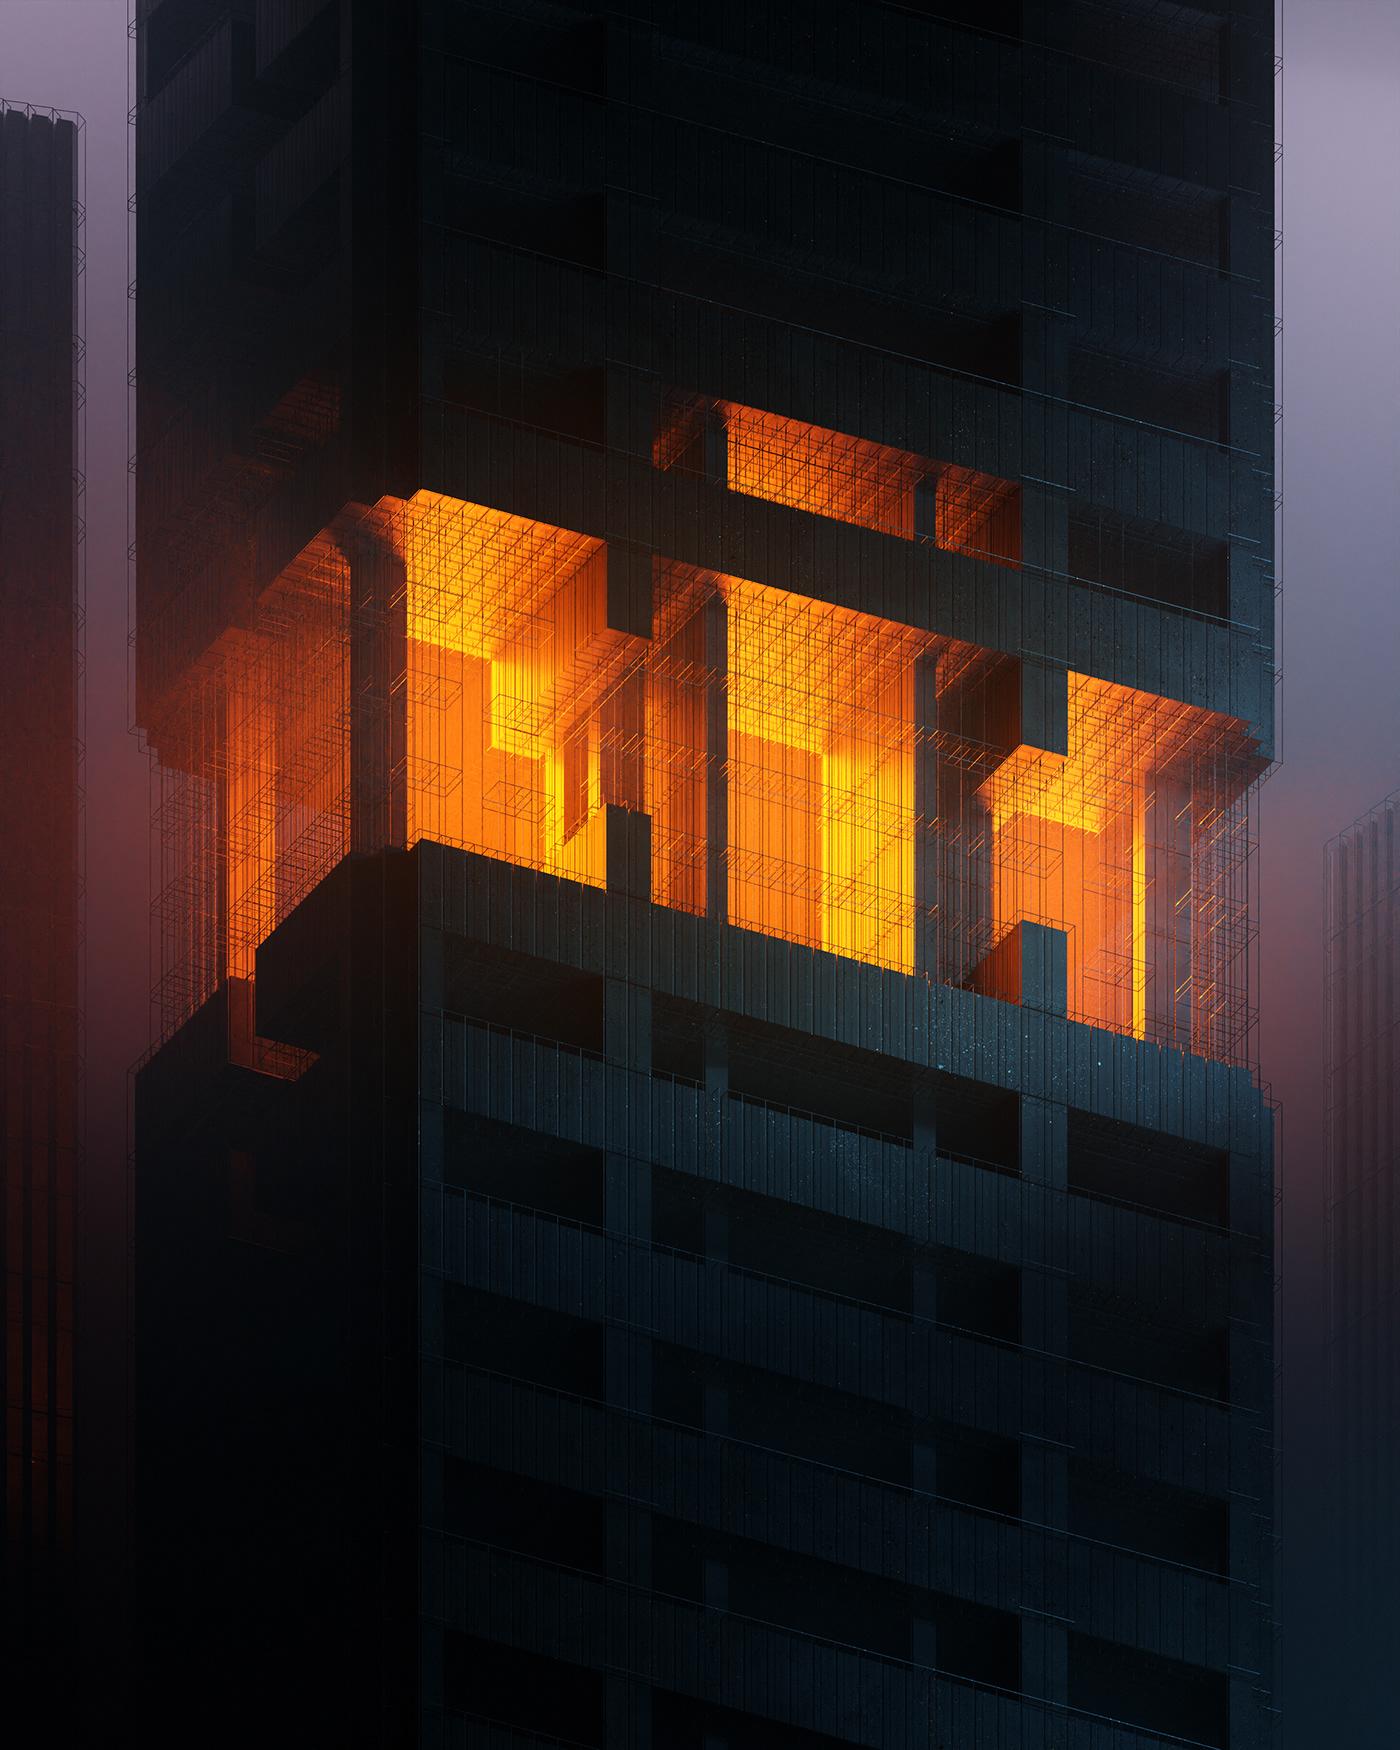 3D aesthetic architecture atmosphere blender Brutalism Insomnia light night Perspective